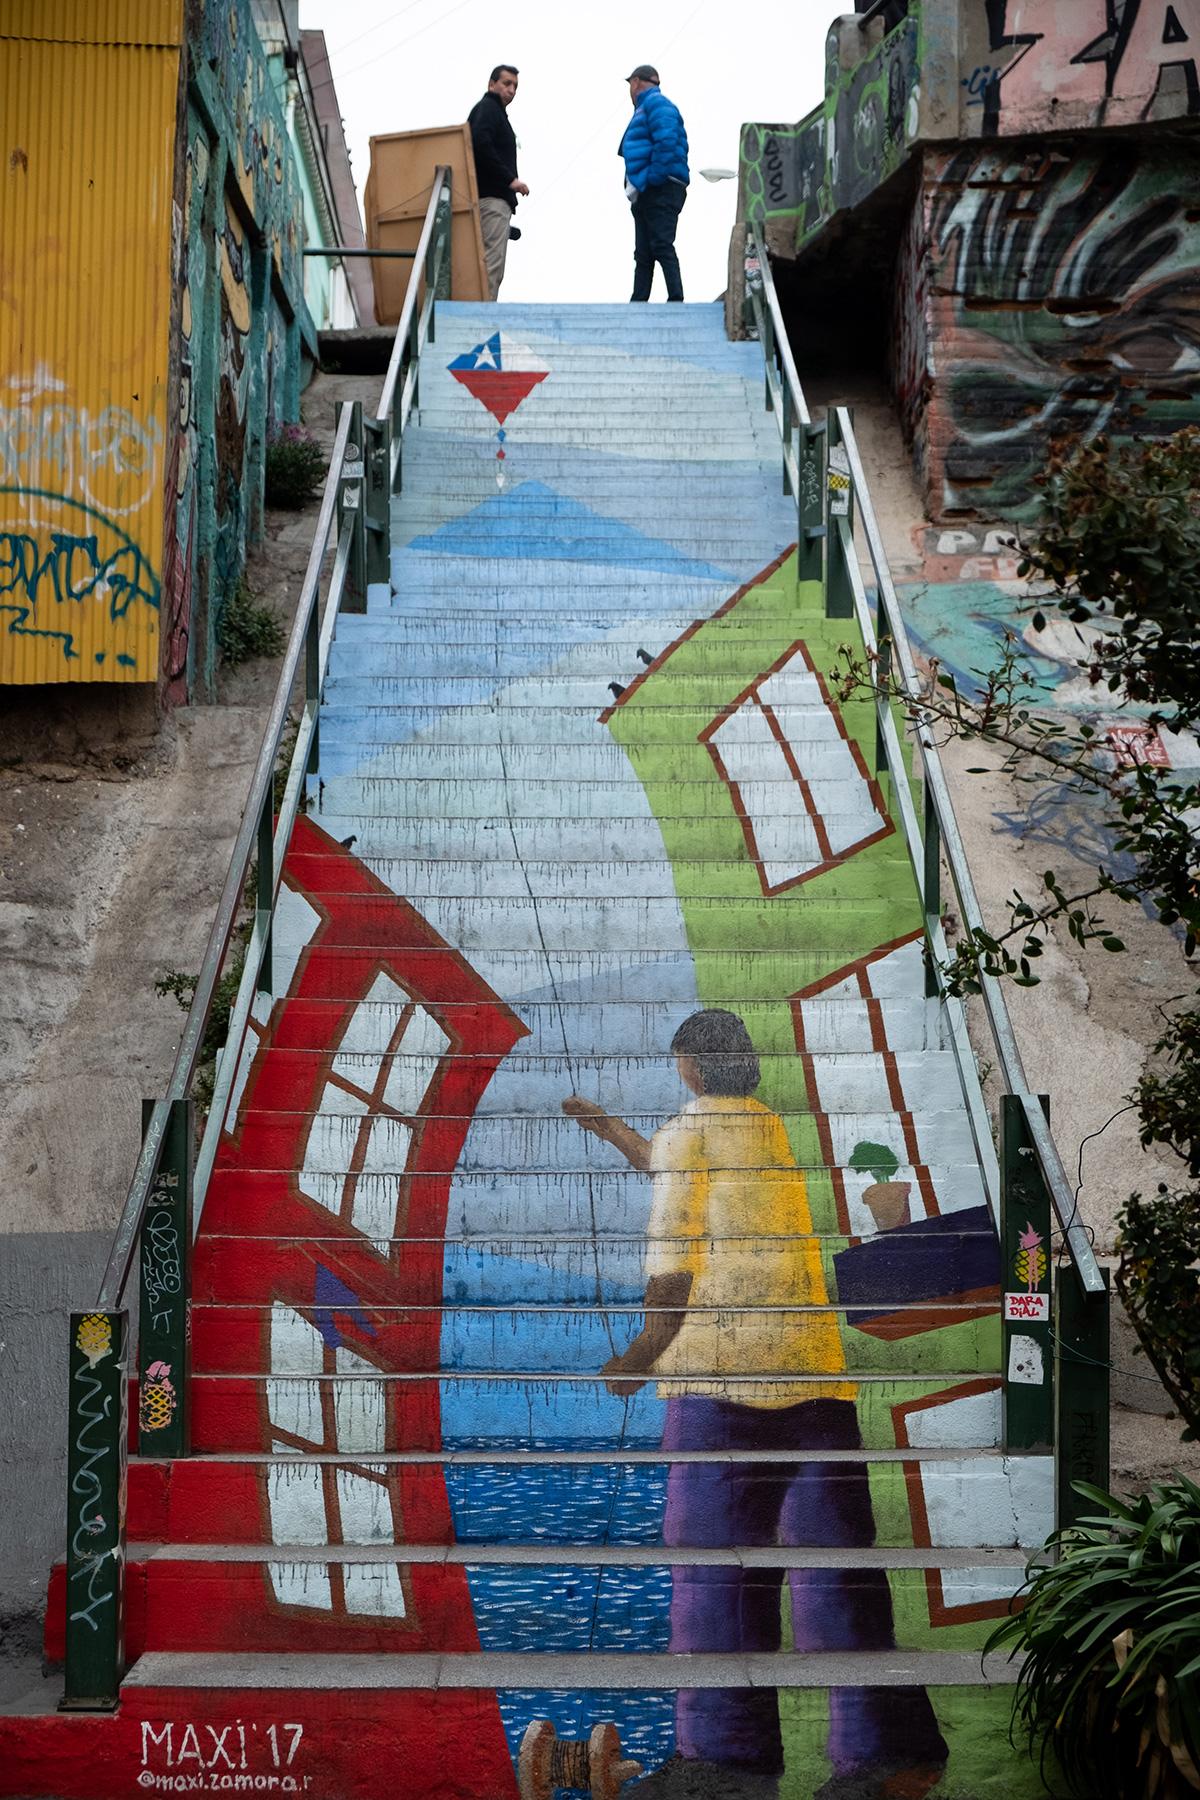 19-04-03---Escaliers-2-(Valparaiso,-Chili).jpg